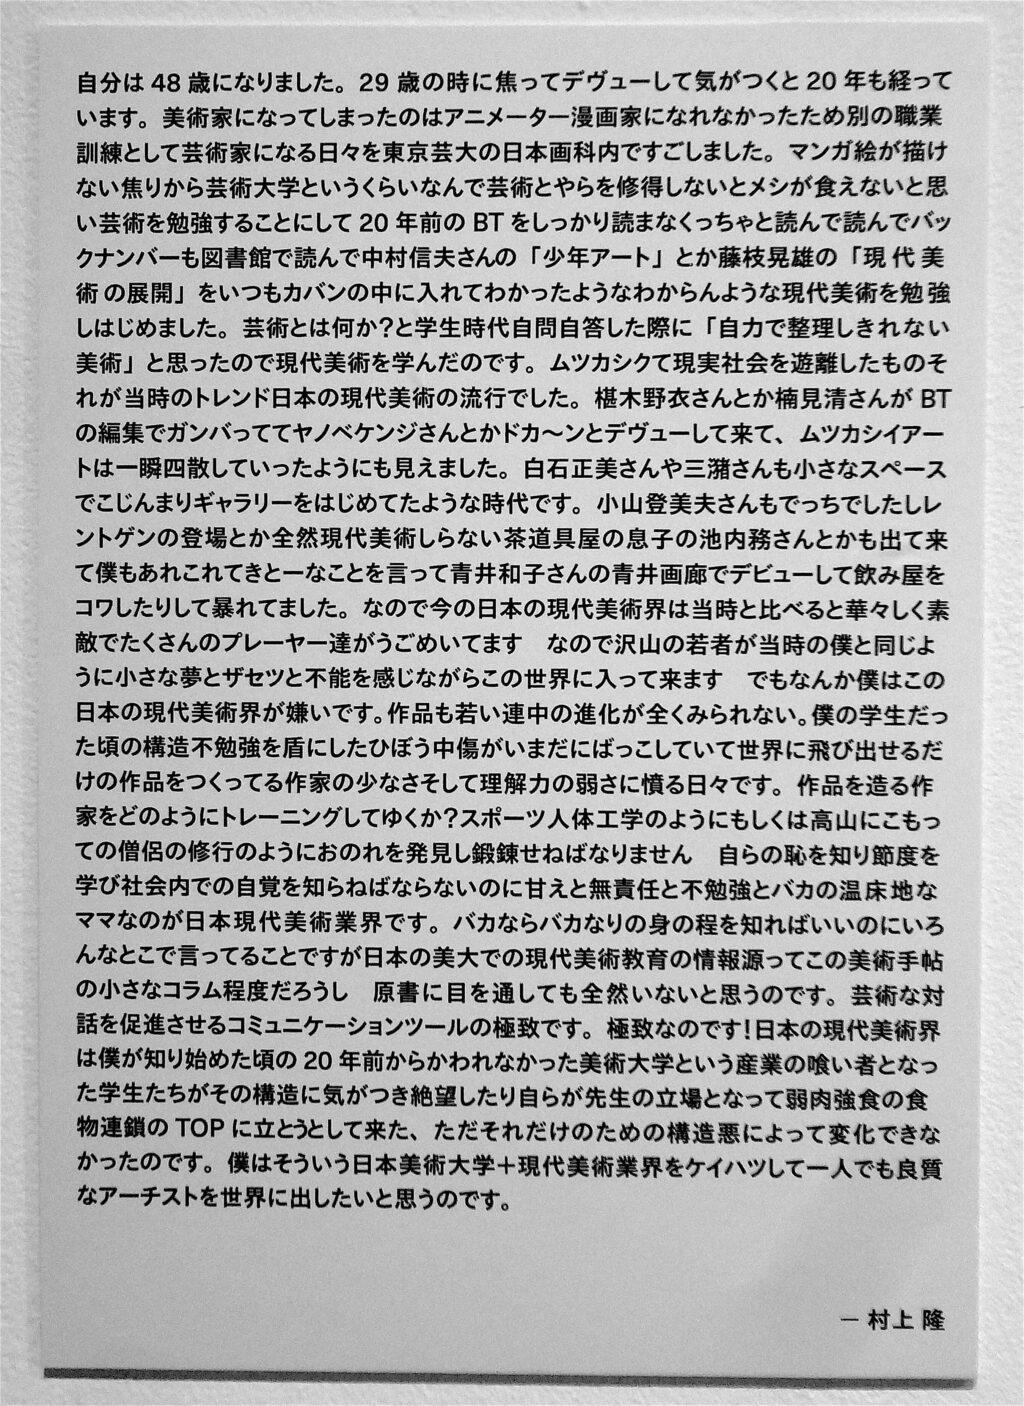 MURAKAMI Takashi 村上隆の五百羅漢図展 The 500 Arhats @ 森美術館 Mori Art Museum 2015 (17)